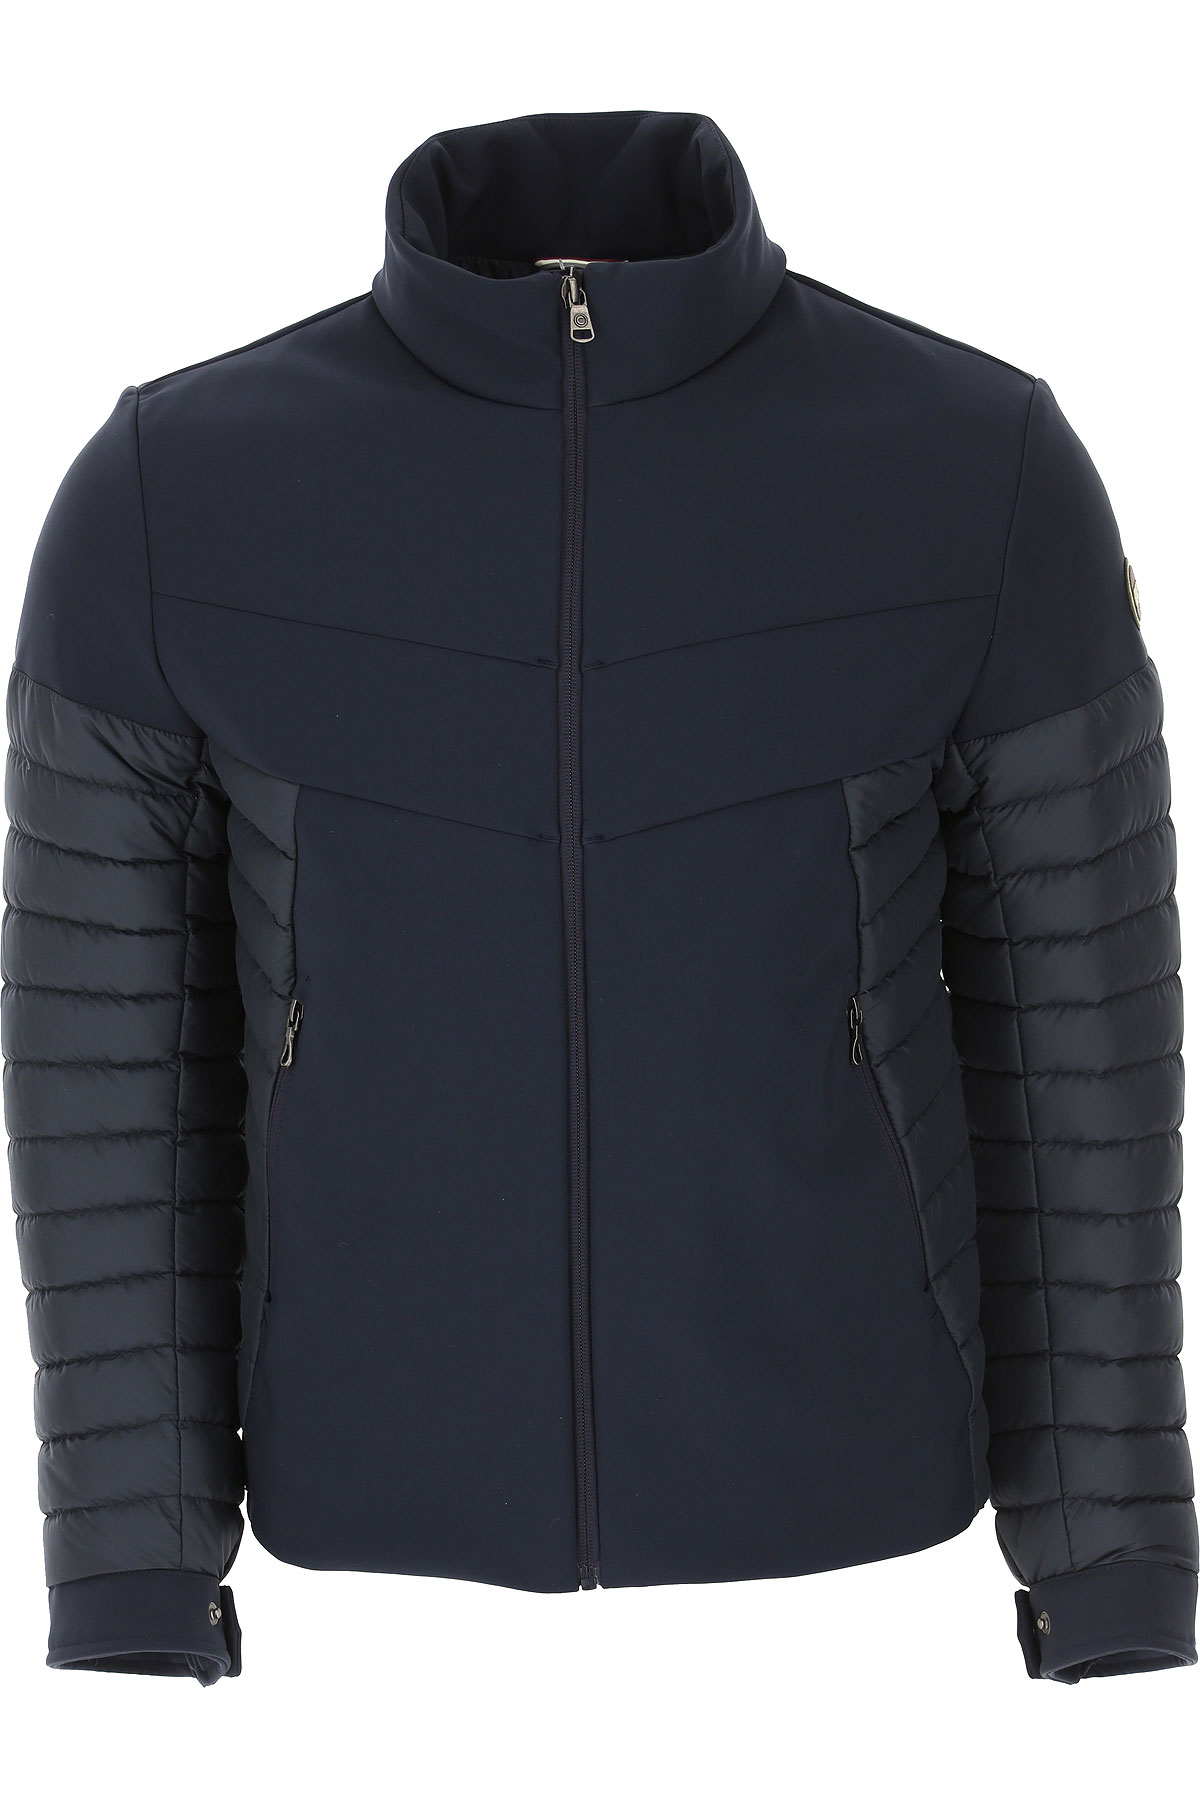 Colmar Down Jacket for Men, Puffer Ski Jacket On Sale, navy, polyester, 2019, L M S XL XXL XXXL